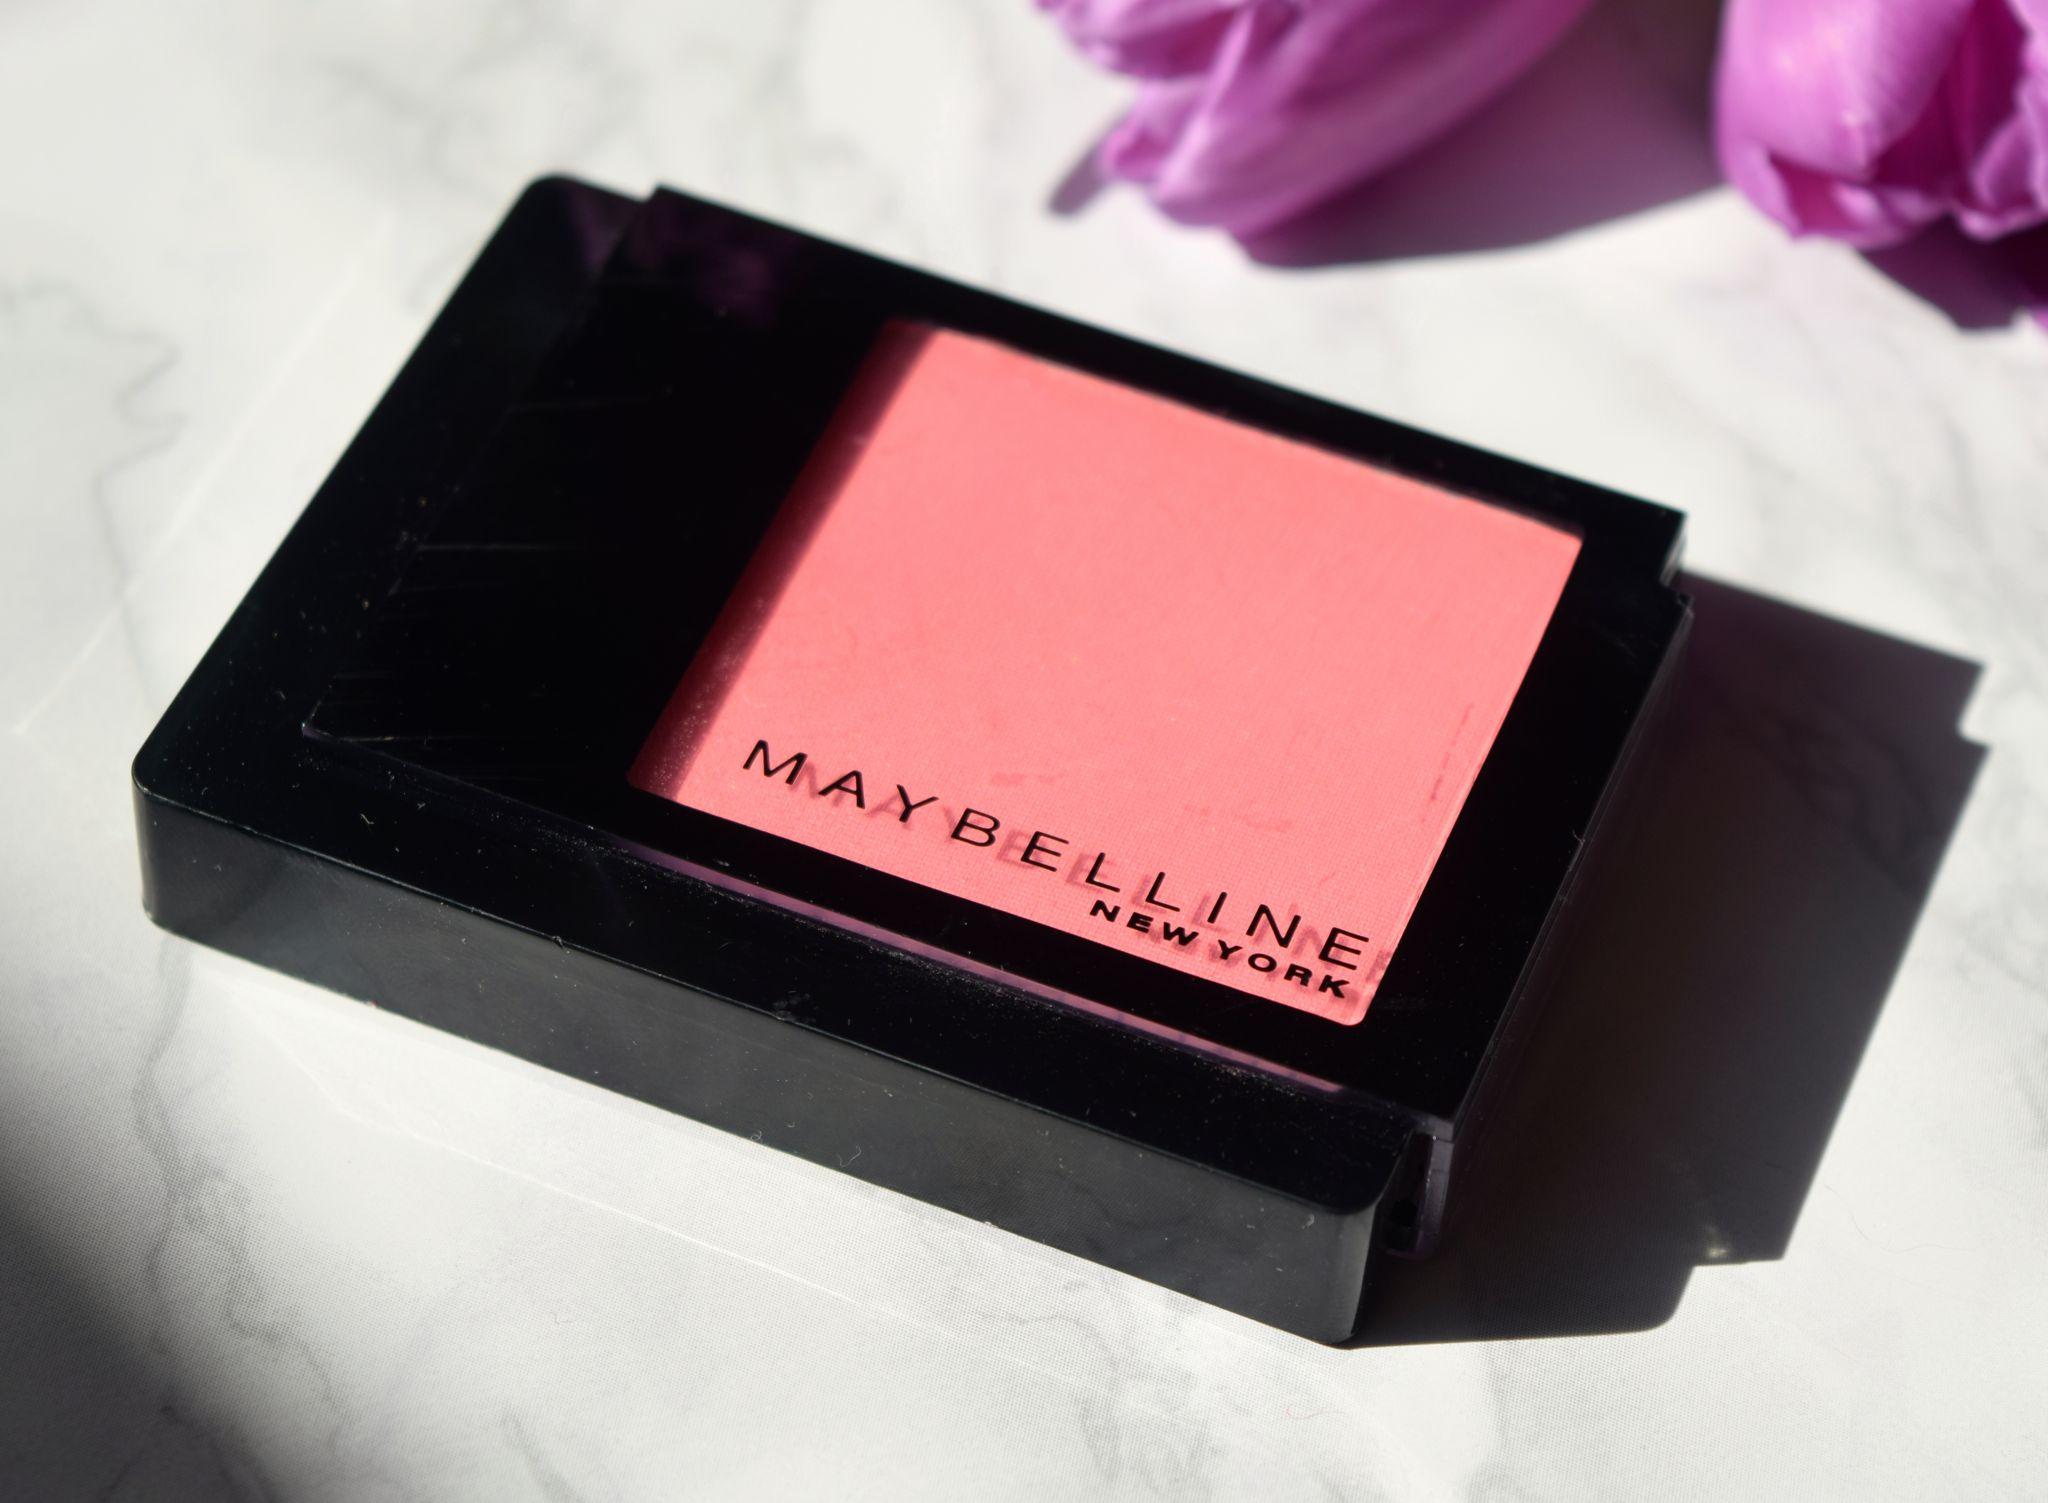 Maybelline Master Heat Allık Affinitone Allık Makyaj Mag